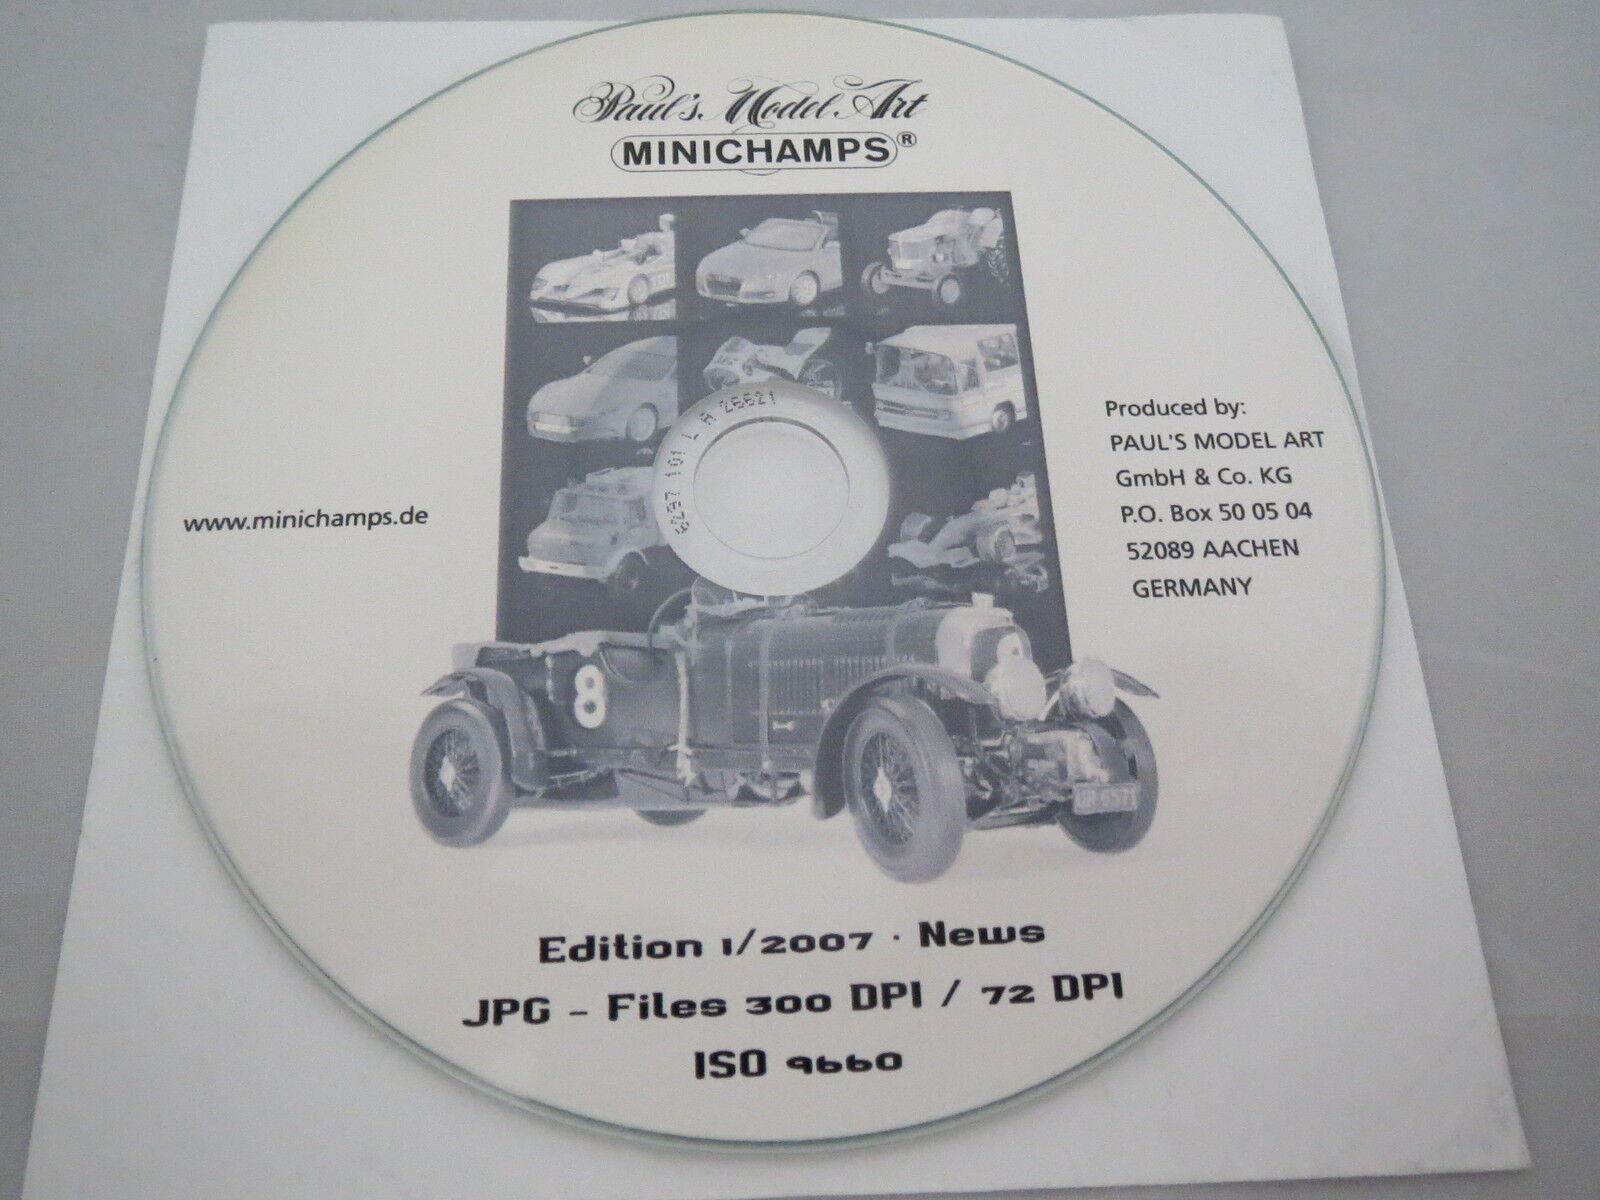 Paul's Paul's Paul's Model Art - Minichamps - 2007 - Edition 1 - CD mit Bildern aller Modelle  | Charmantes Design  f35a0b